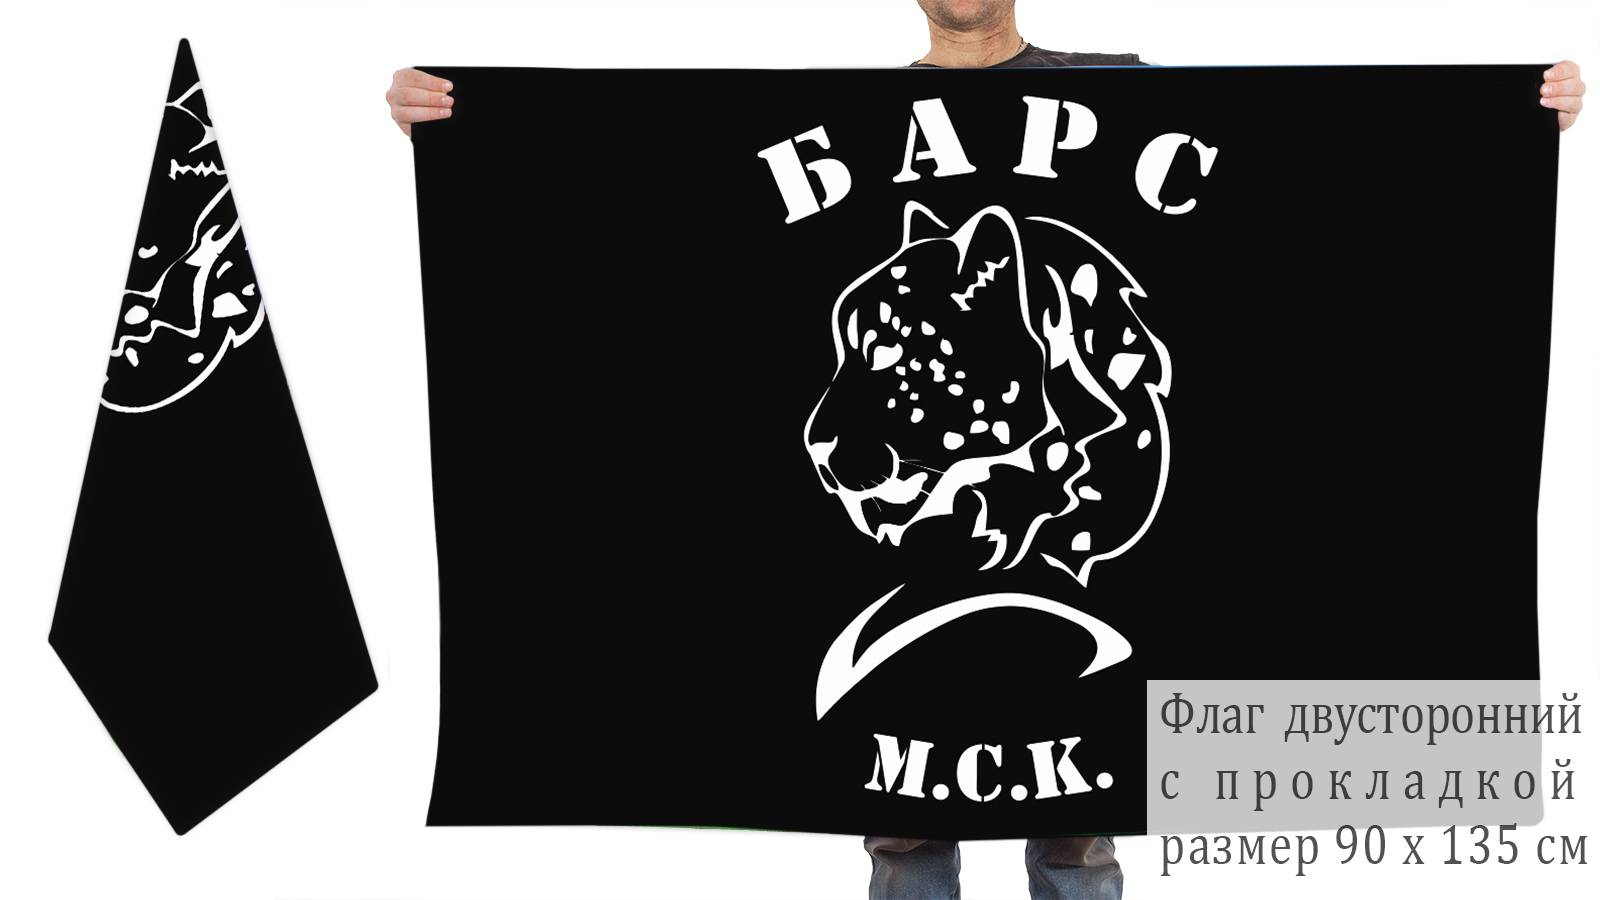 Двусторонний флаг СК Барс М.С.К.